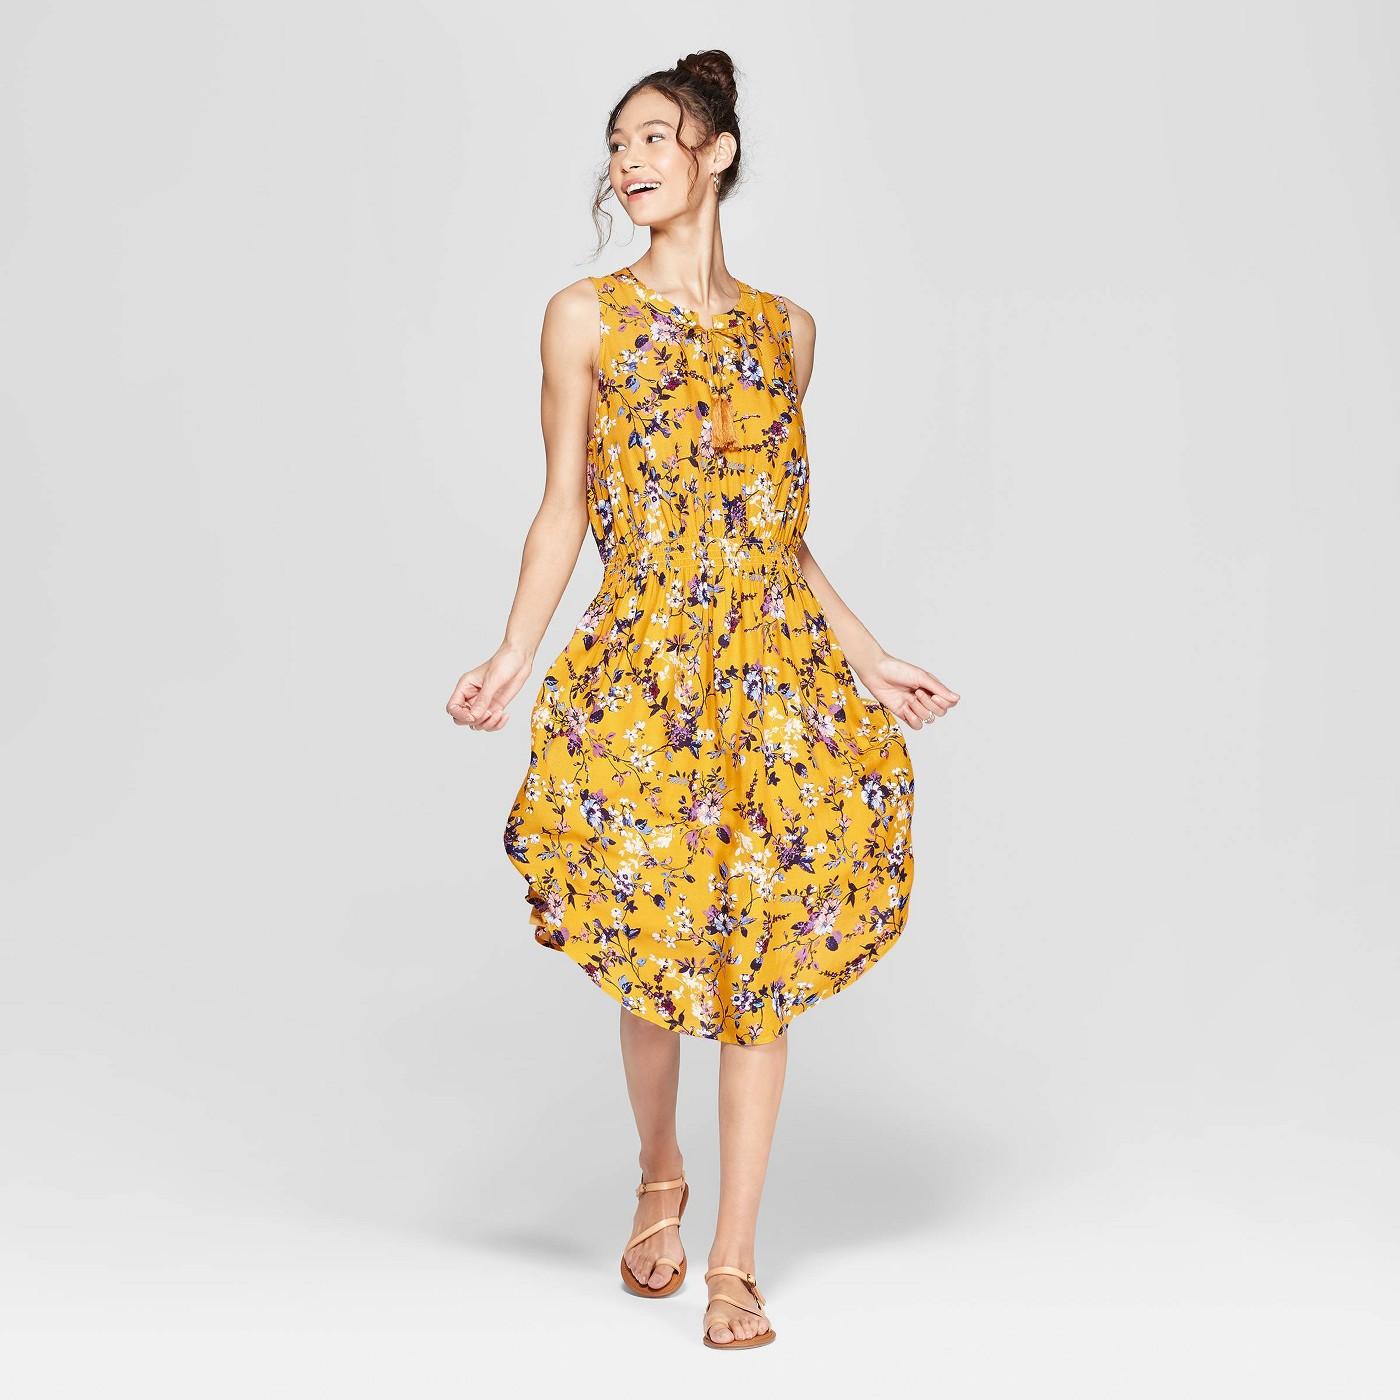 Women's Floral Print Sleeveless V-Neck Cinched Waist Midi Dress - Xhilaration™ Mustard Yellow - image 1 of 2